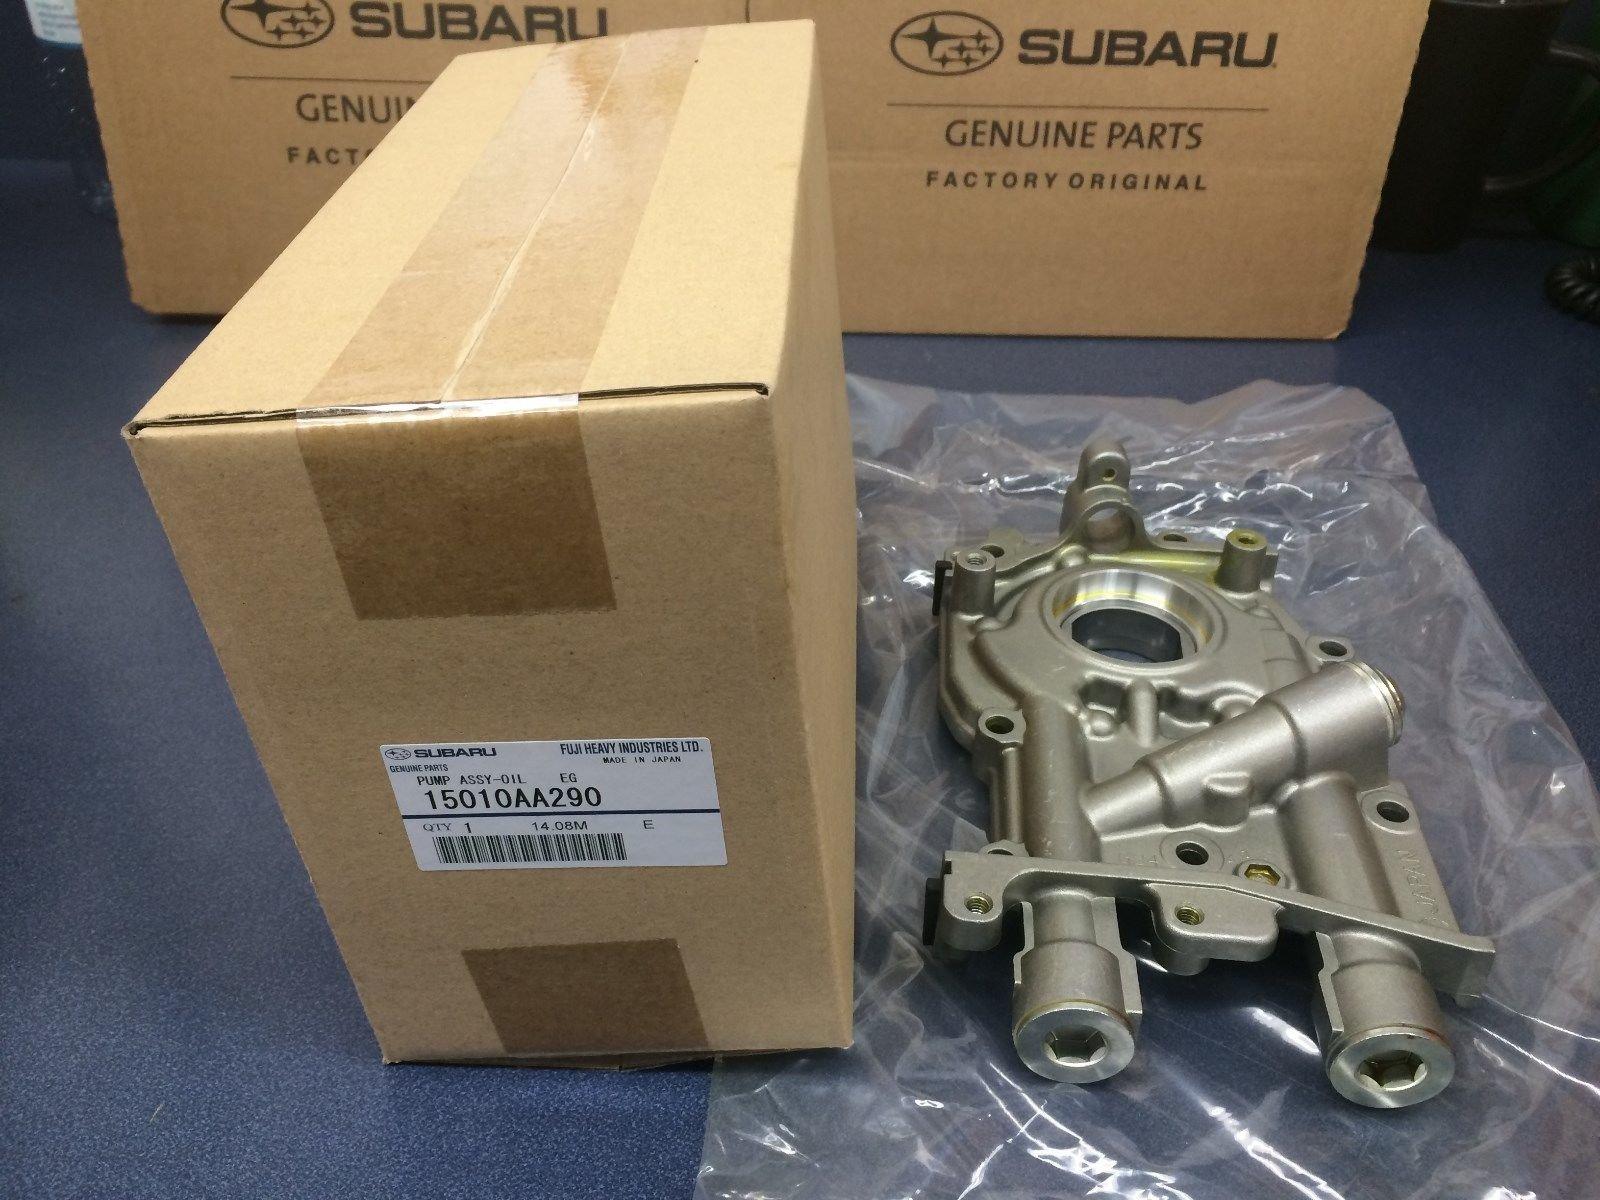 Genuine OEM Subaru Oil Pump Impreza Legacy Forester Baja 2002-2006 2.5 Non turbo 15010AA290 by Subaru